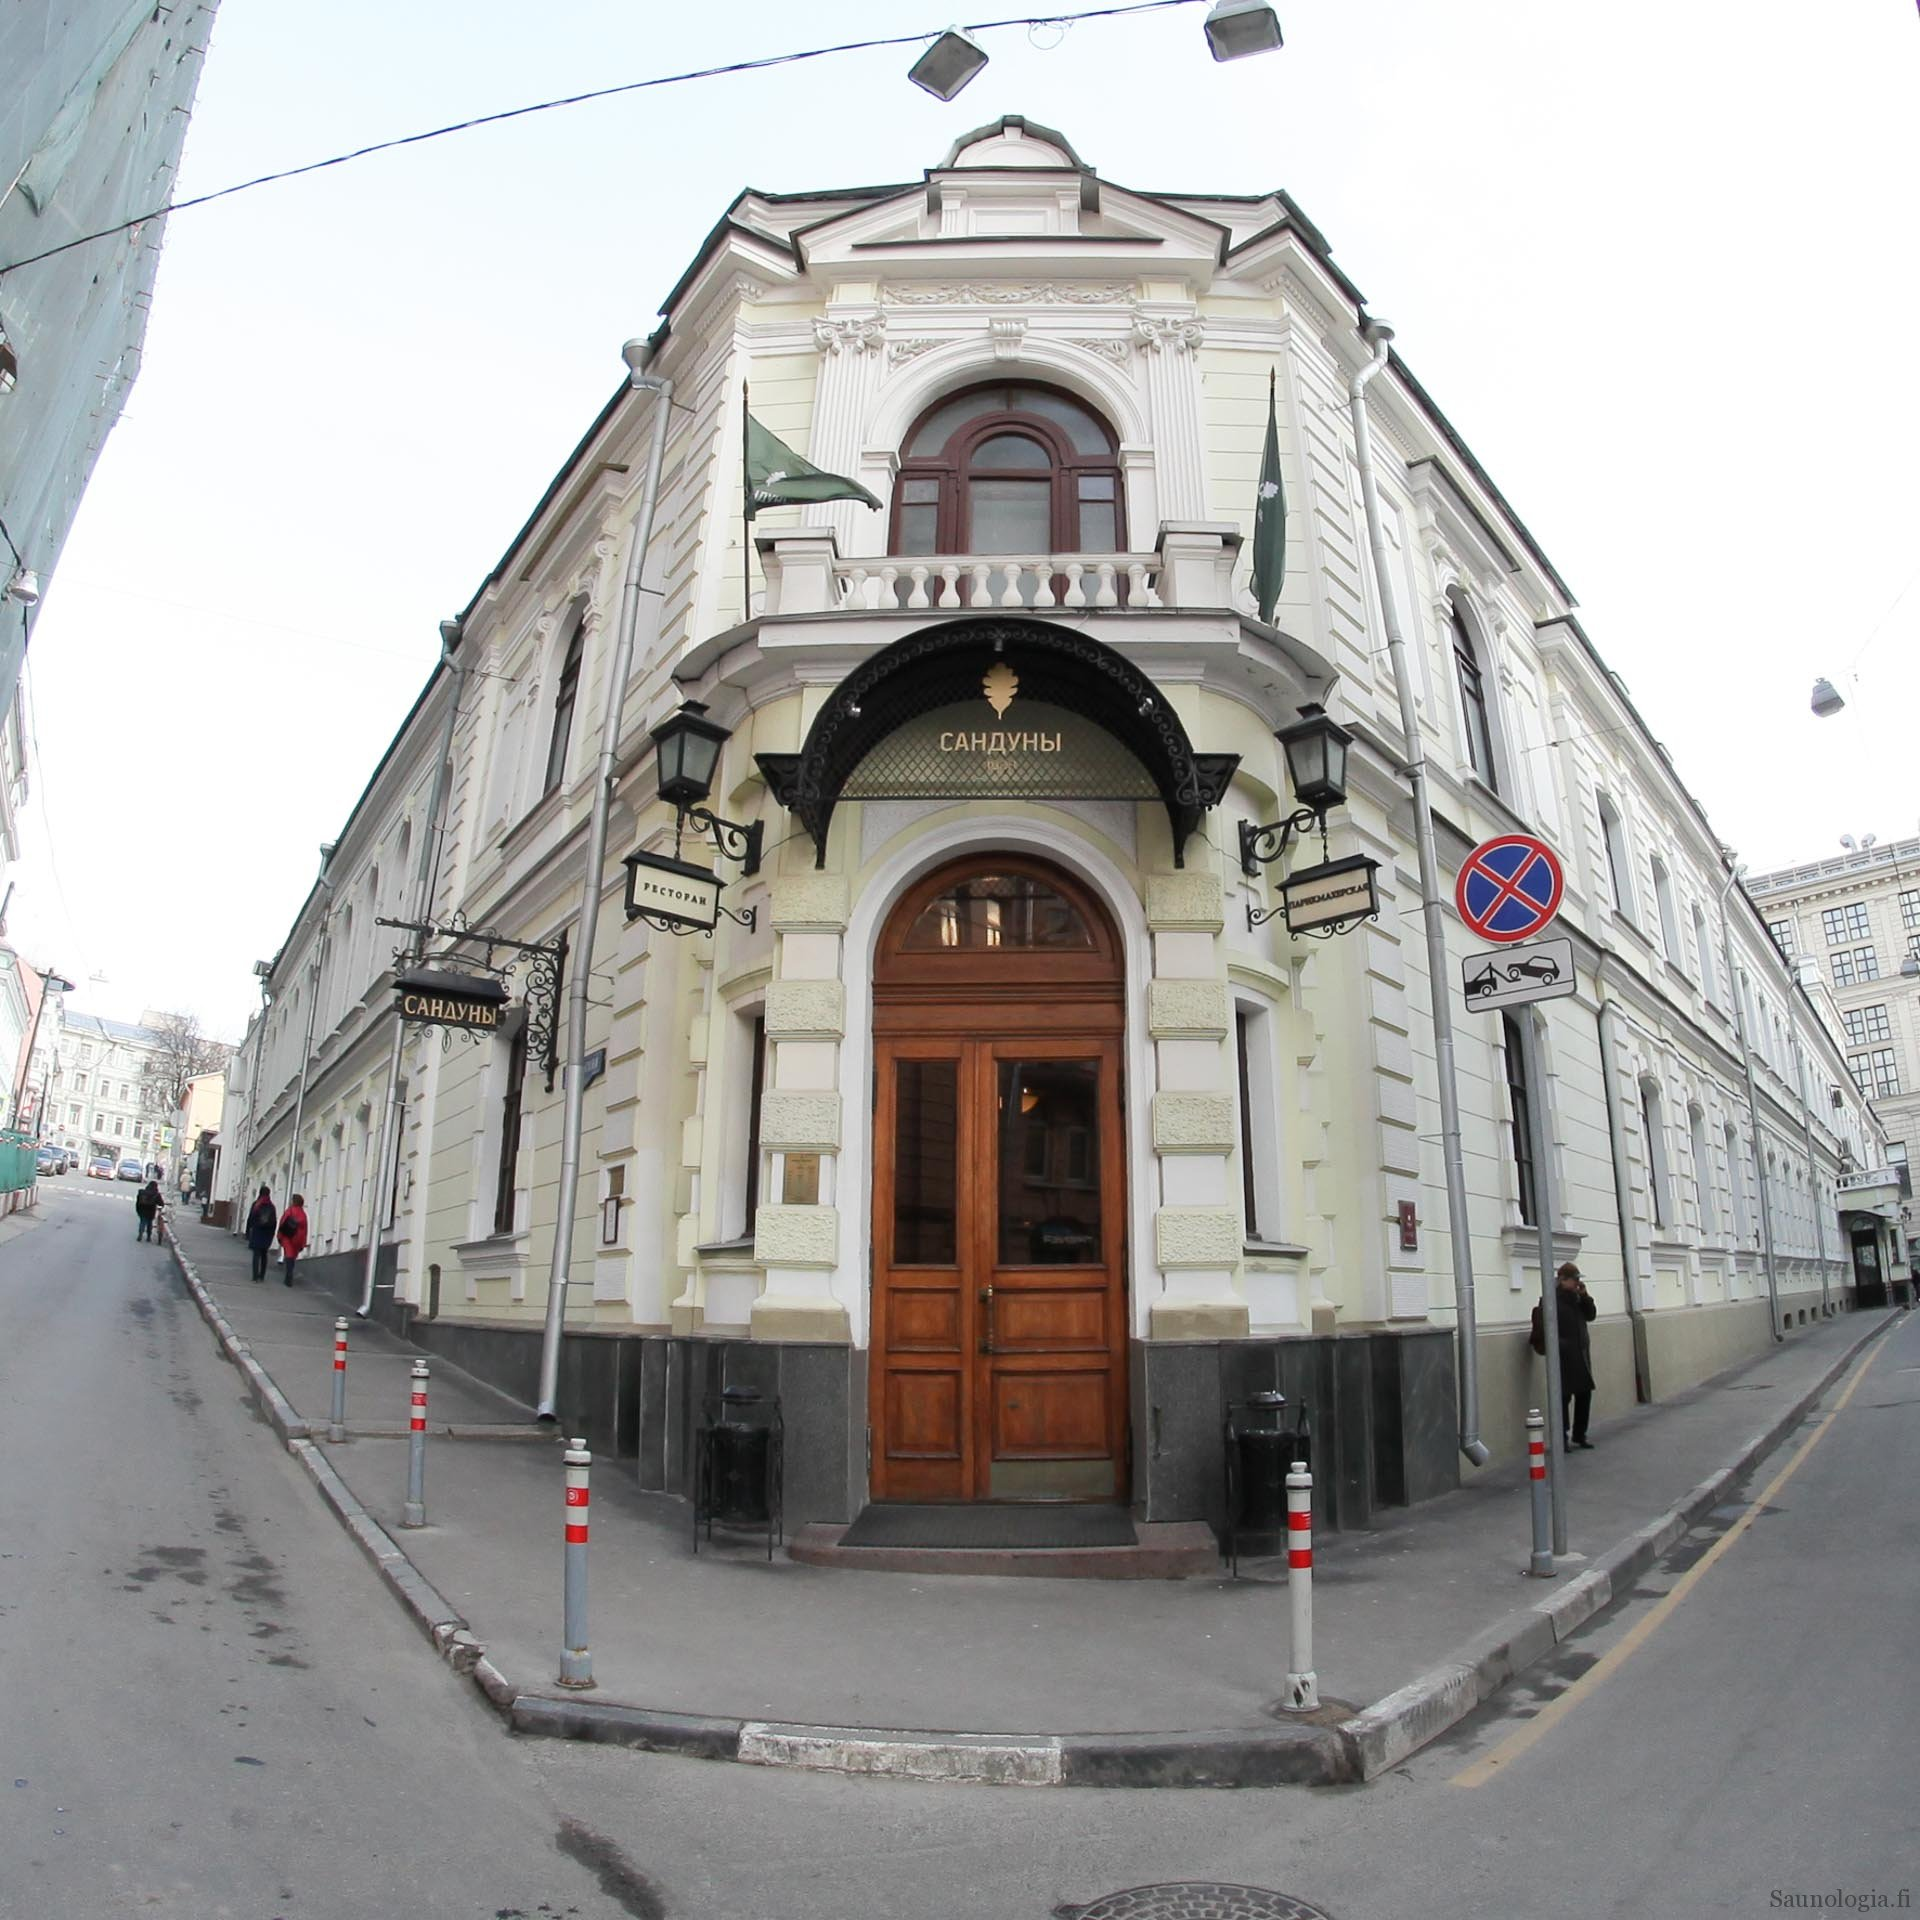 171003-moscow-sanduny-street